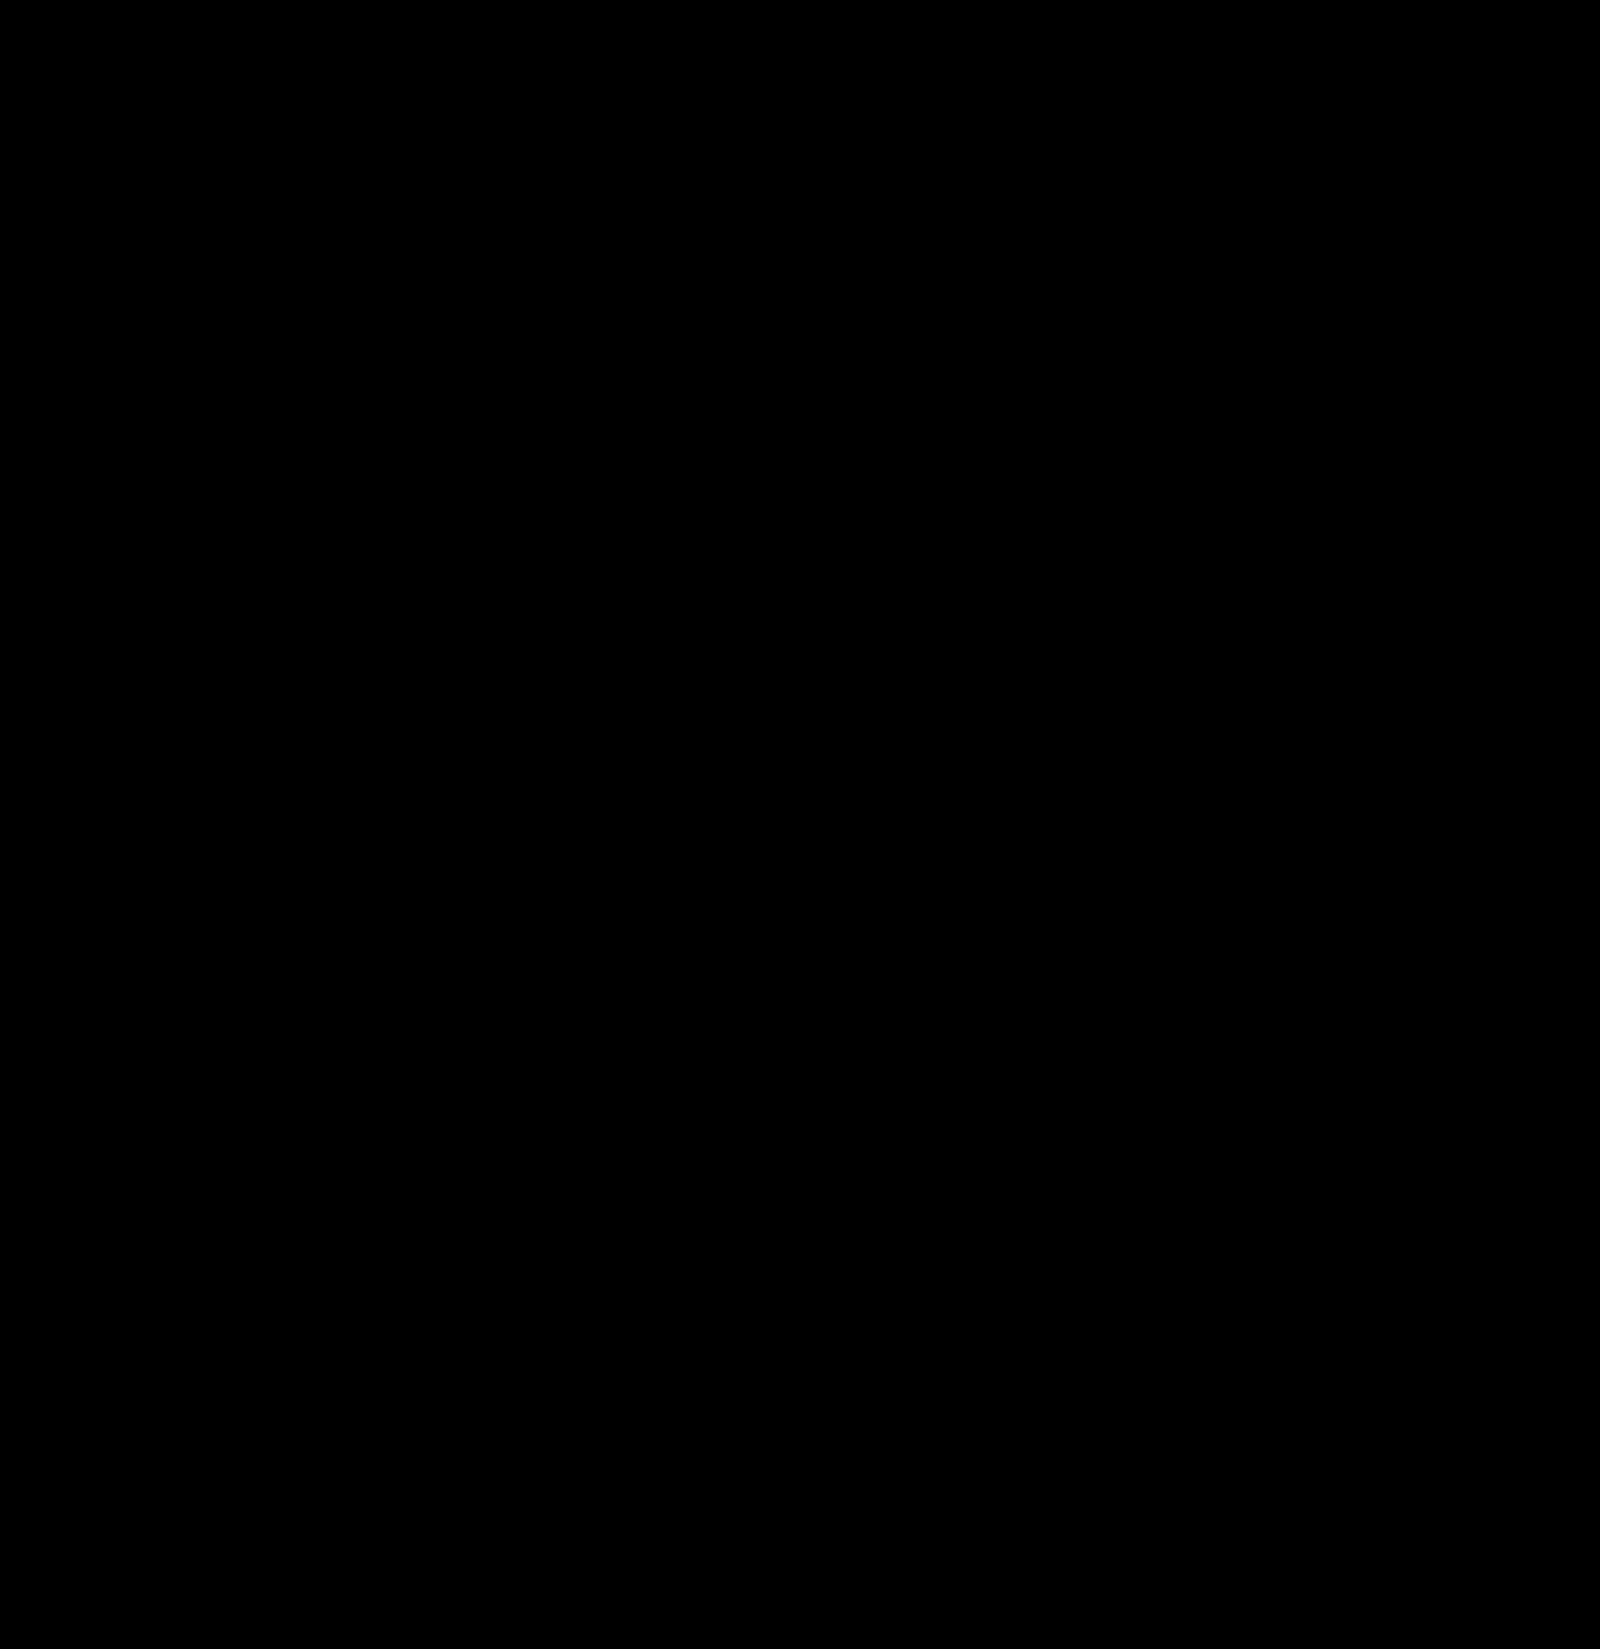 https://img00.deviantart.net/0767/i/2013/343/0/f/chibi_l_lineart_by_cantrona-d3agt2l.png